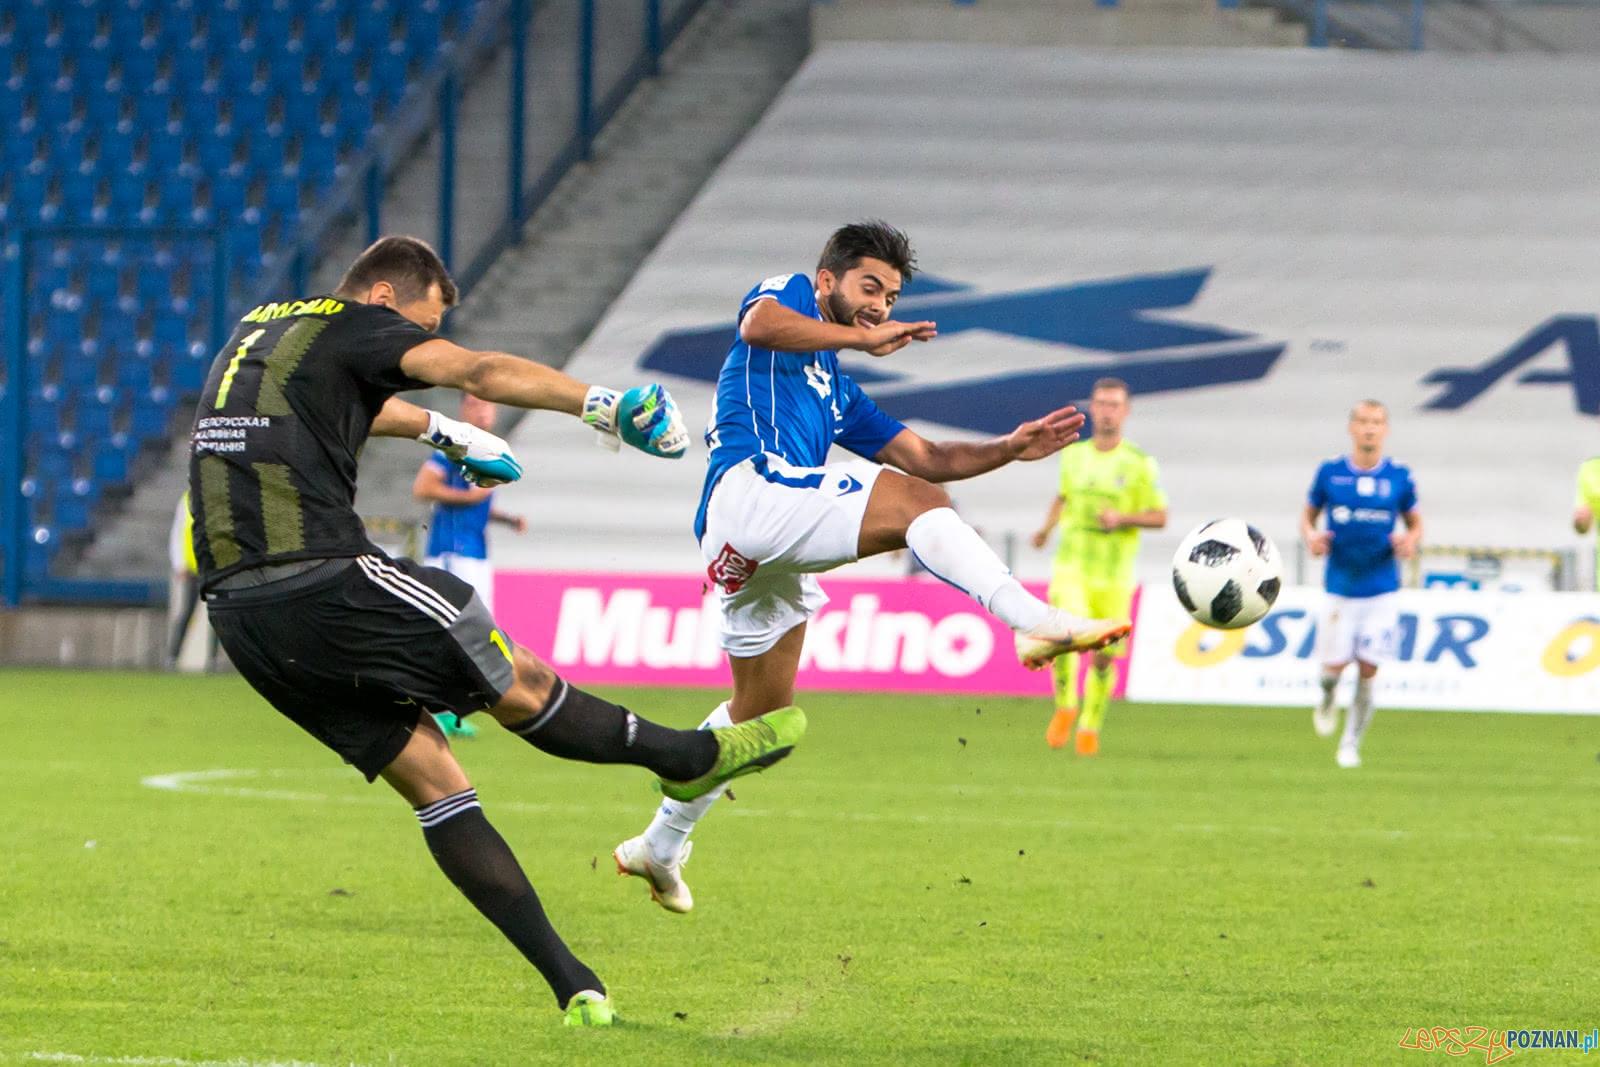 Lech Poznań - FC Shakhtyor Soligorsk (Joao pedro Reis Amaral, A  Foto: lepszyPOZNAN.pl/Piotr Rychter